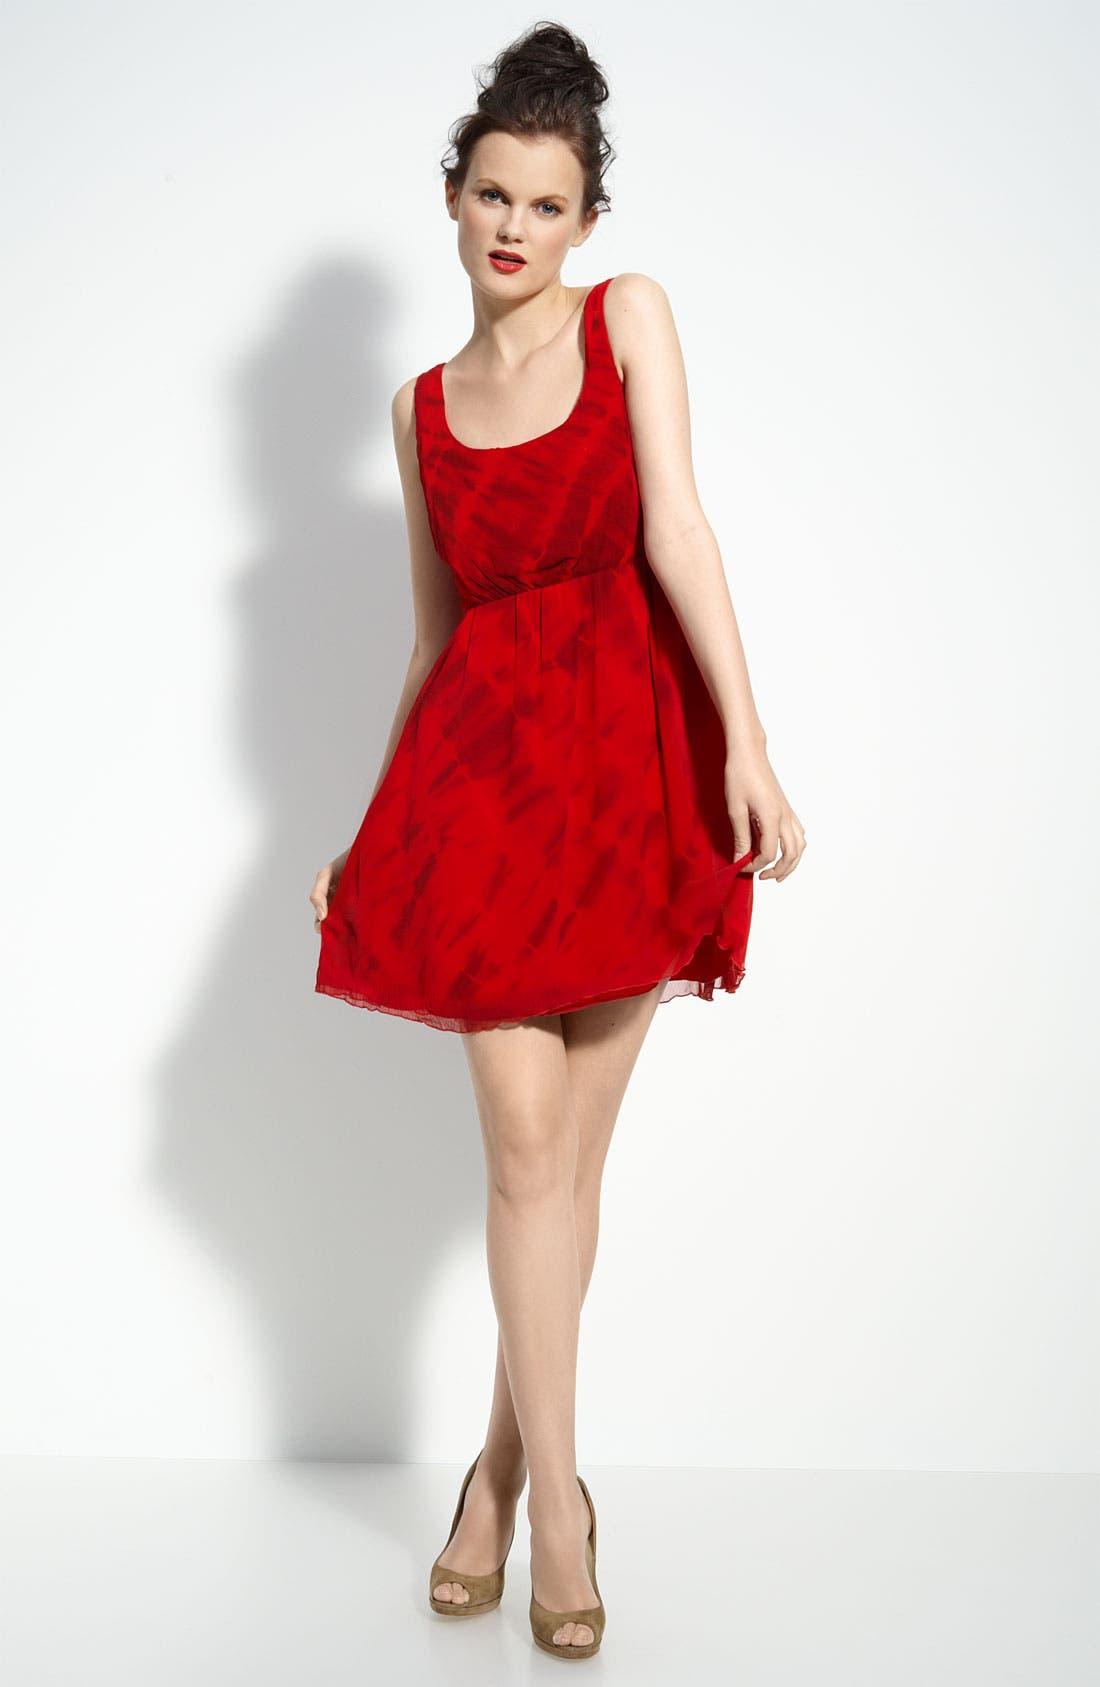 Main Image - Alice + Olivia 'Cabella' Tie Dye Tank Dress